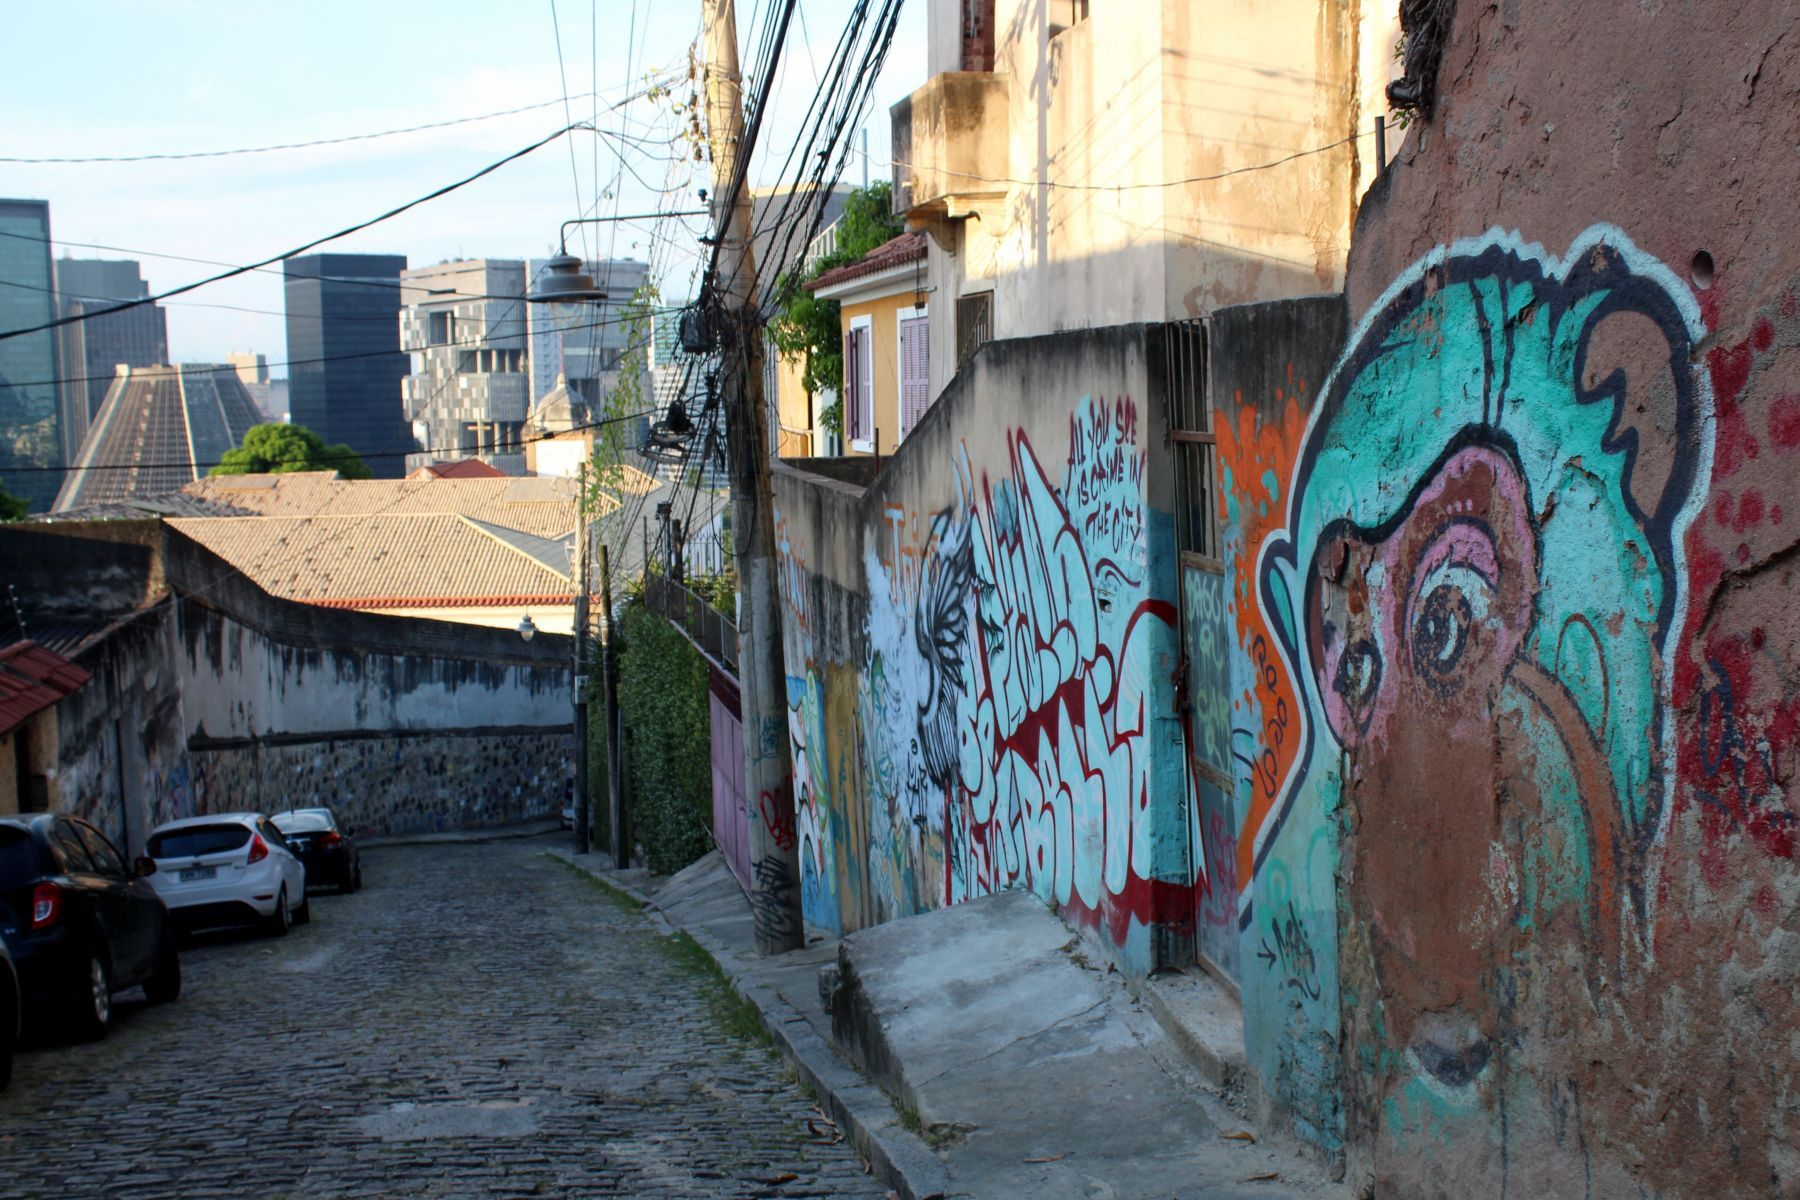 Colorful graffiti adorns the streets of Santa Teresa.